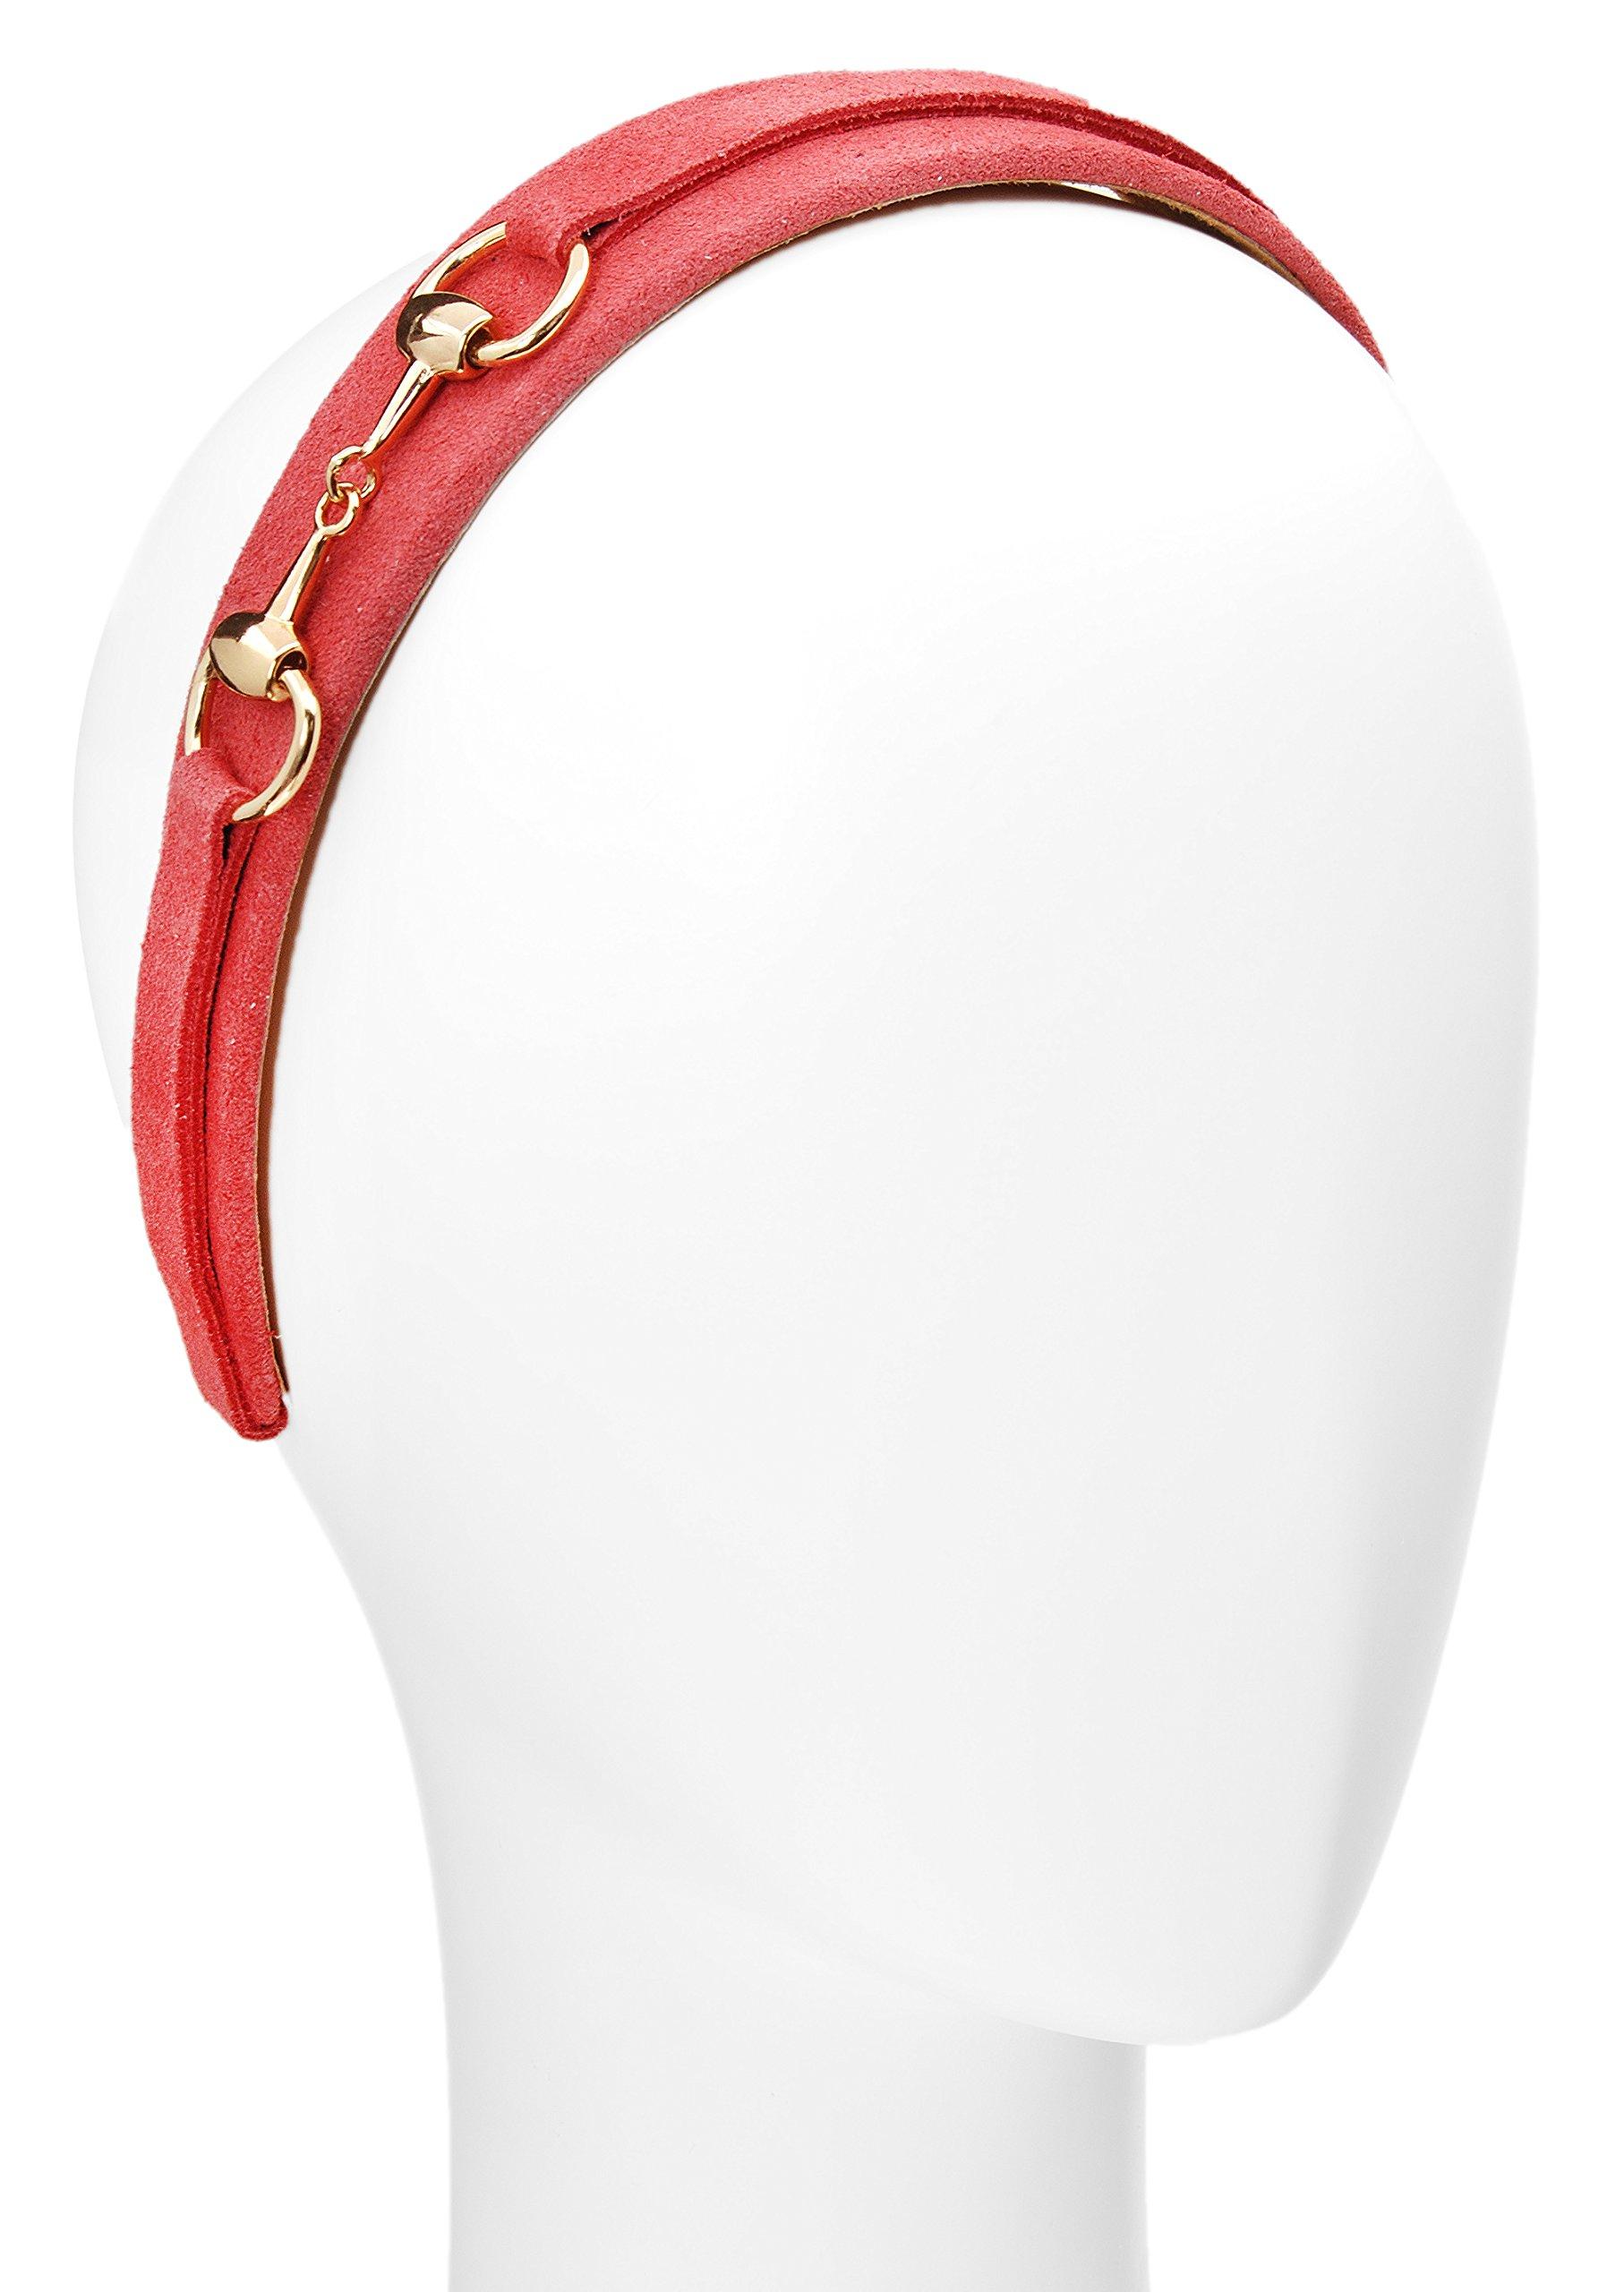 L. Erickson USA Suede Bit Headband - Coral by L. Erickson USA